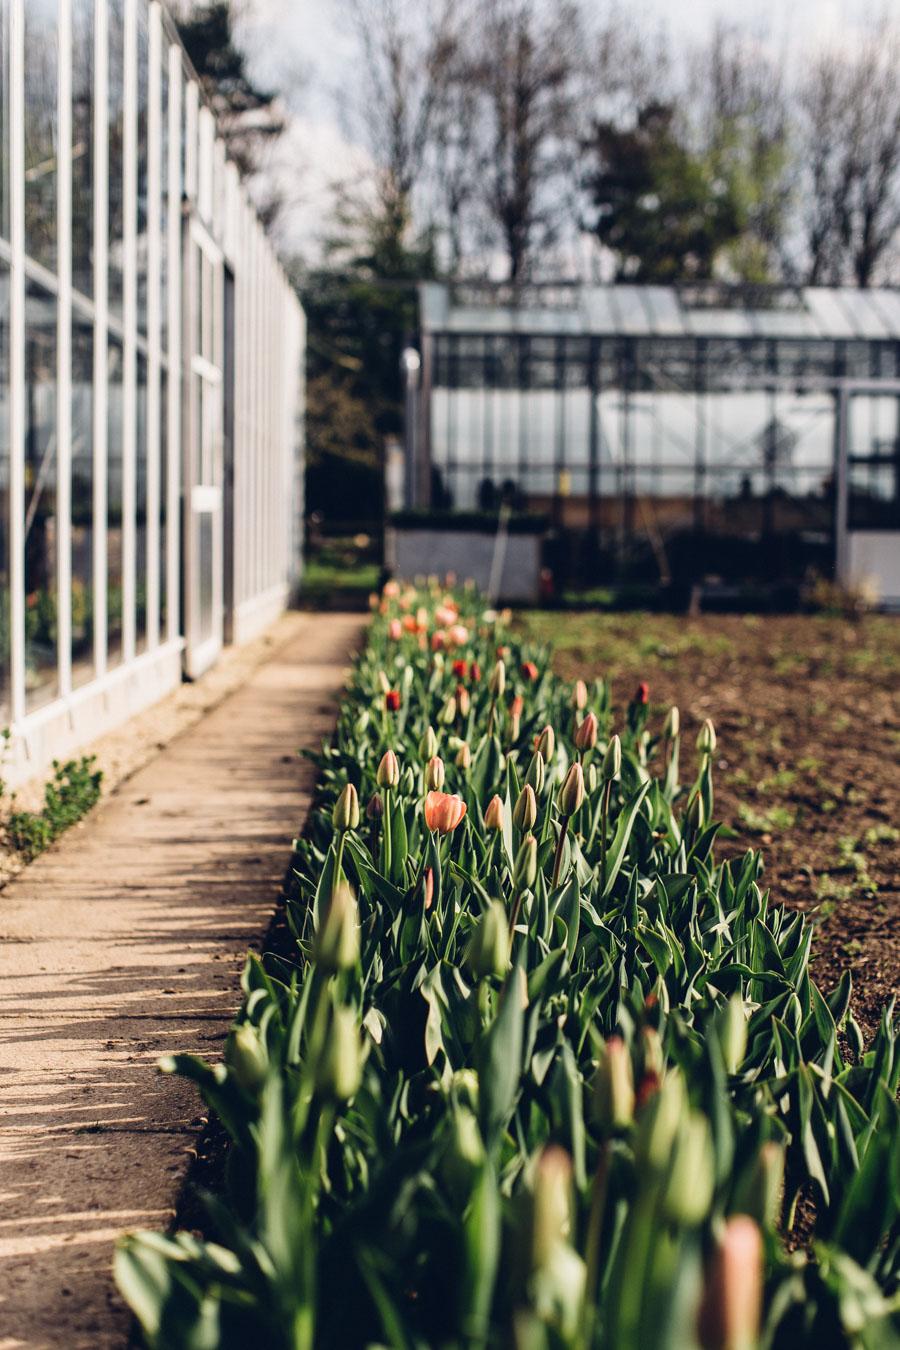 Tulip aisle